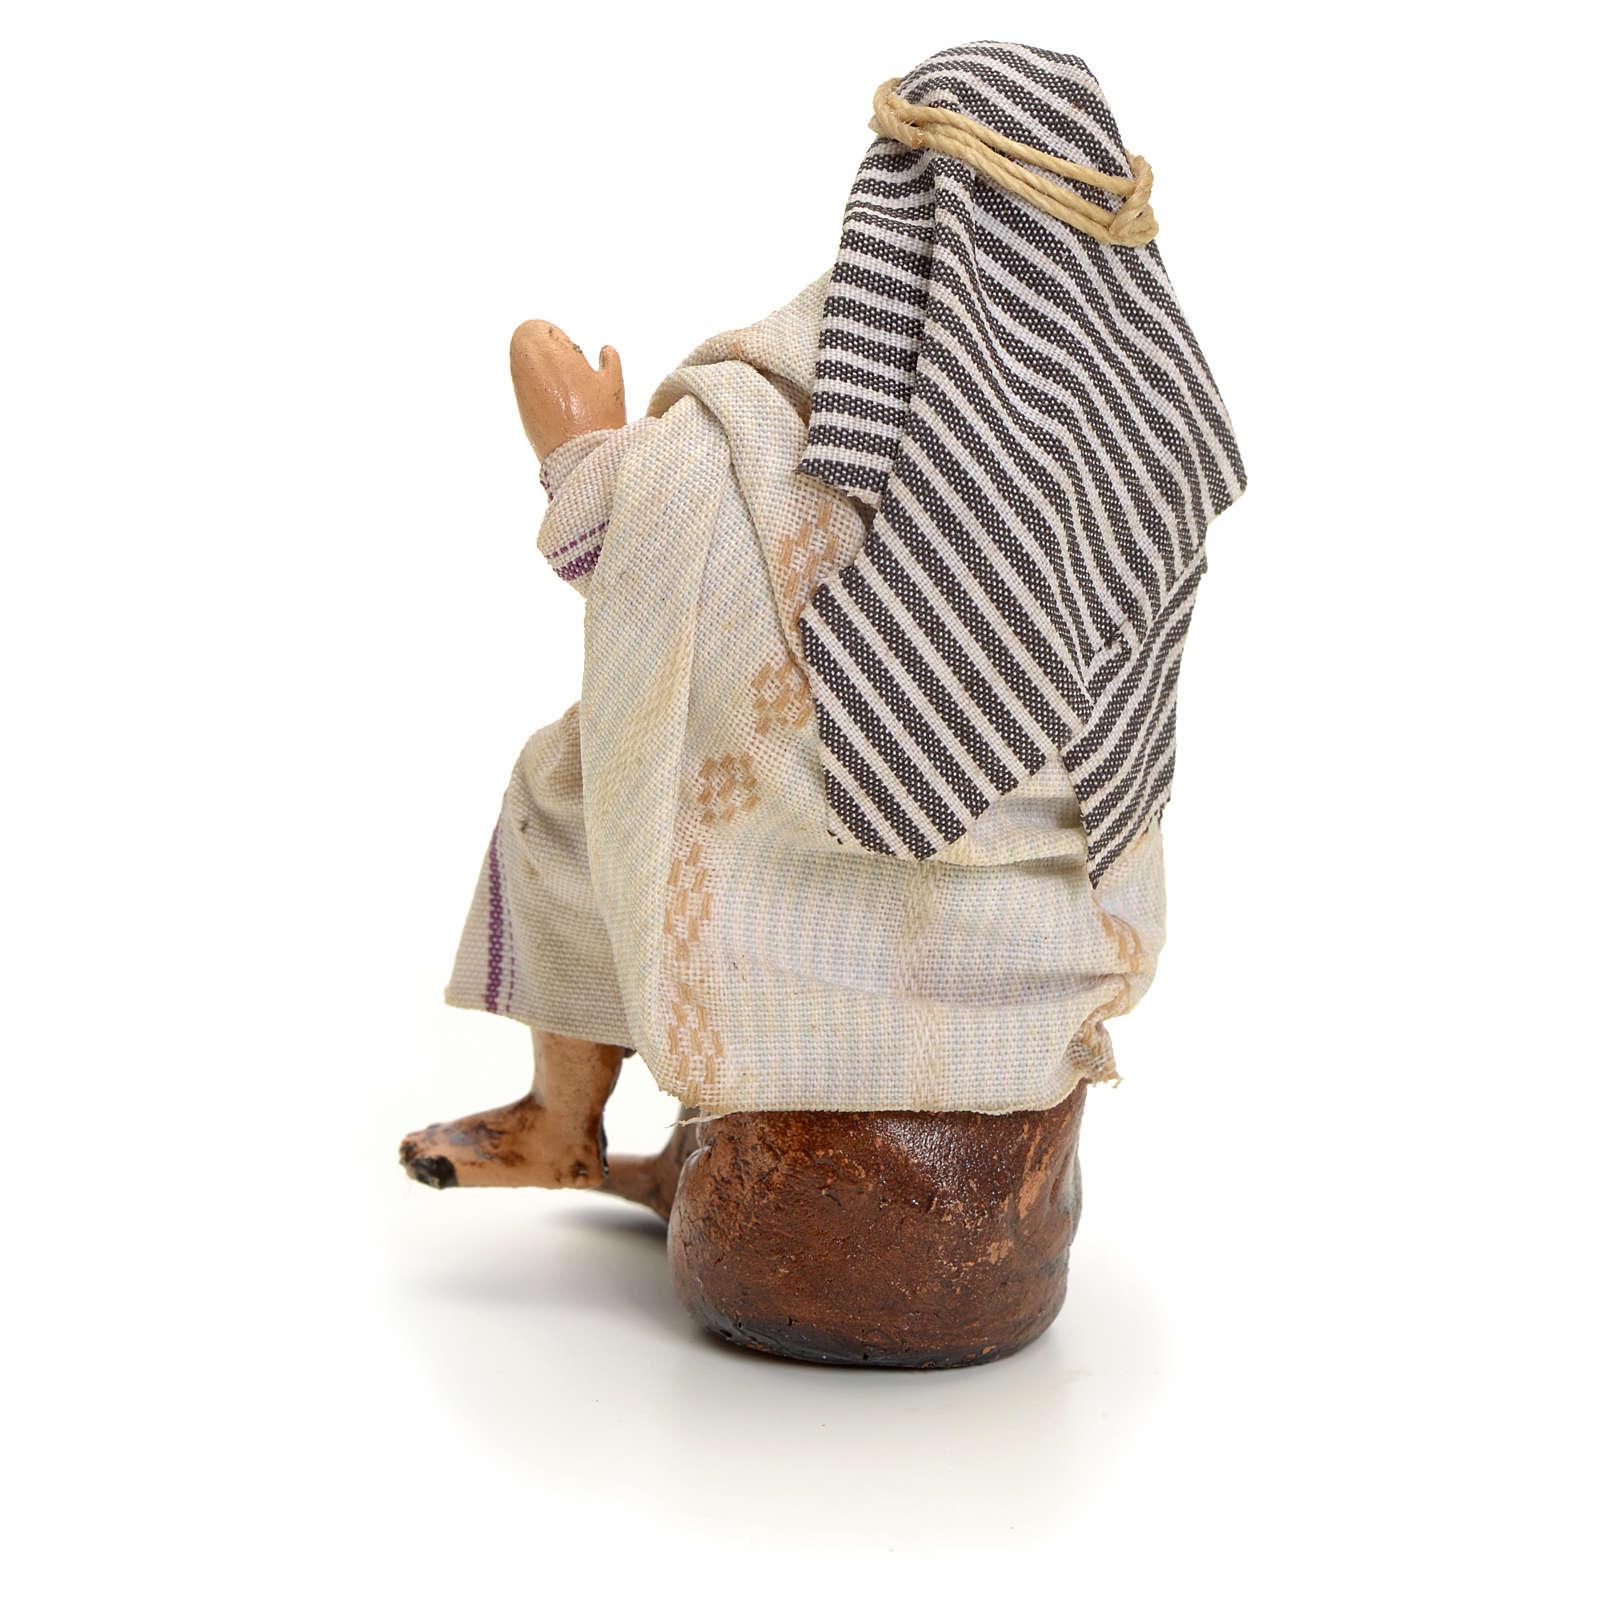 Neapolitan Nativity figurine, Arabian man with wine, 8 cm 4